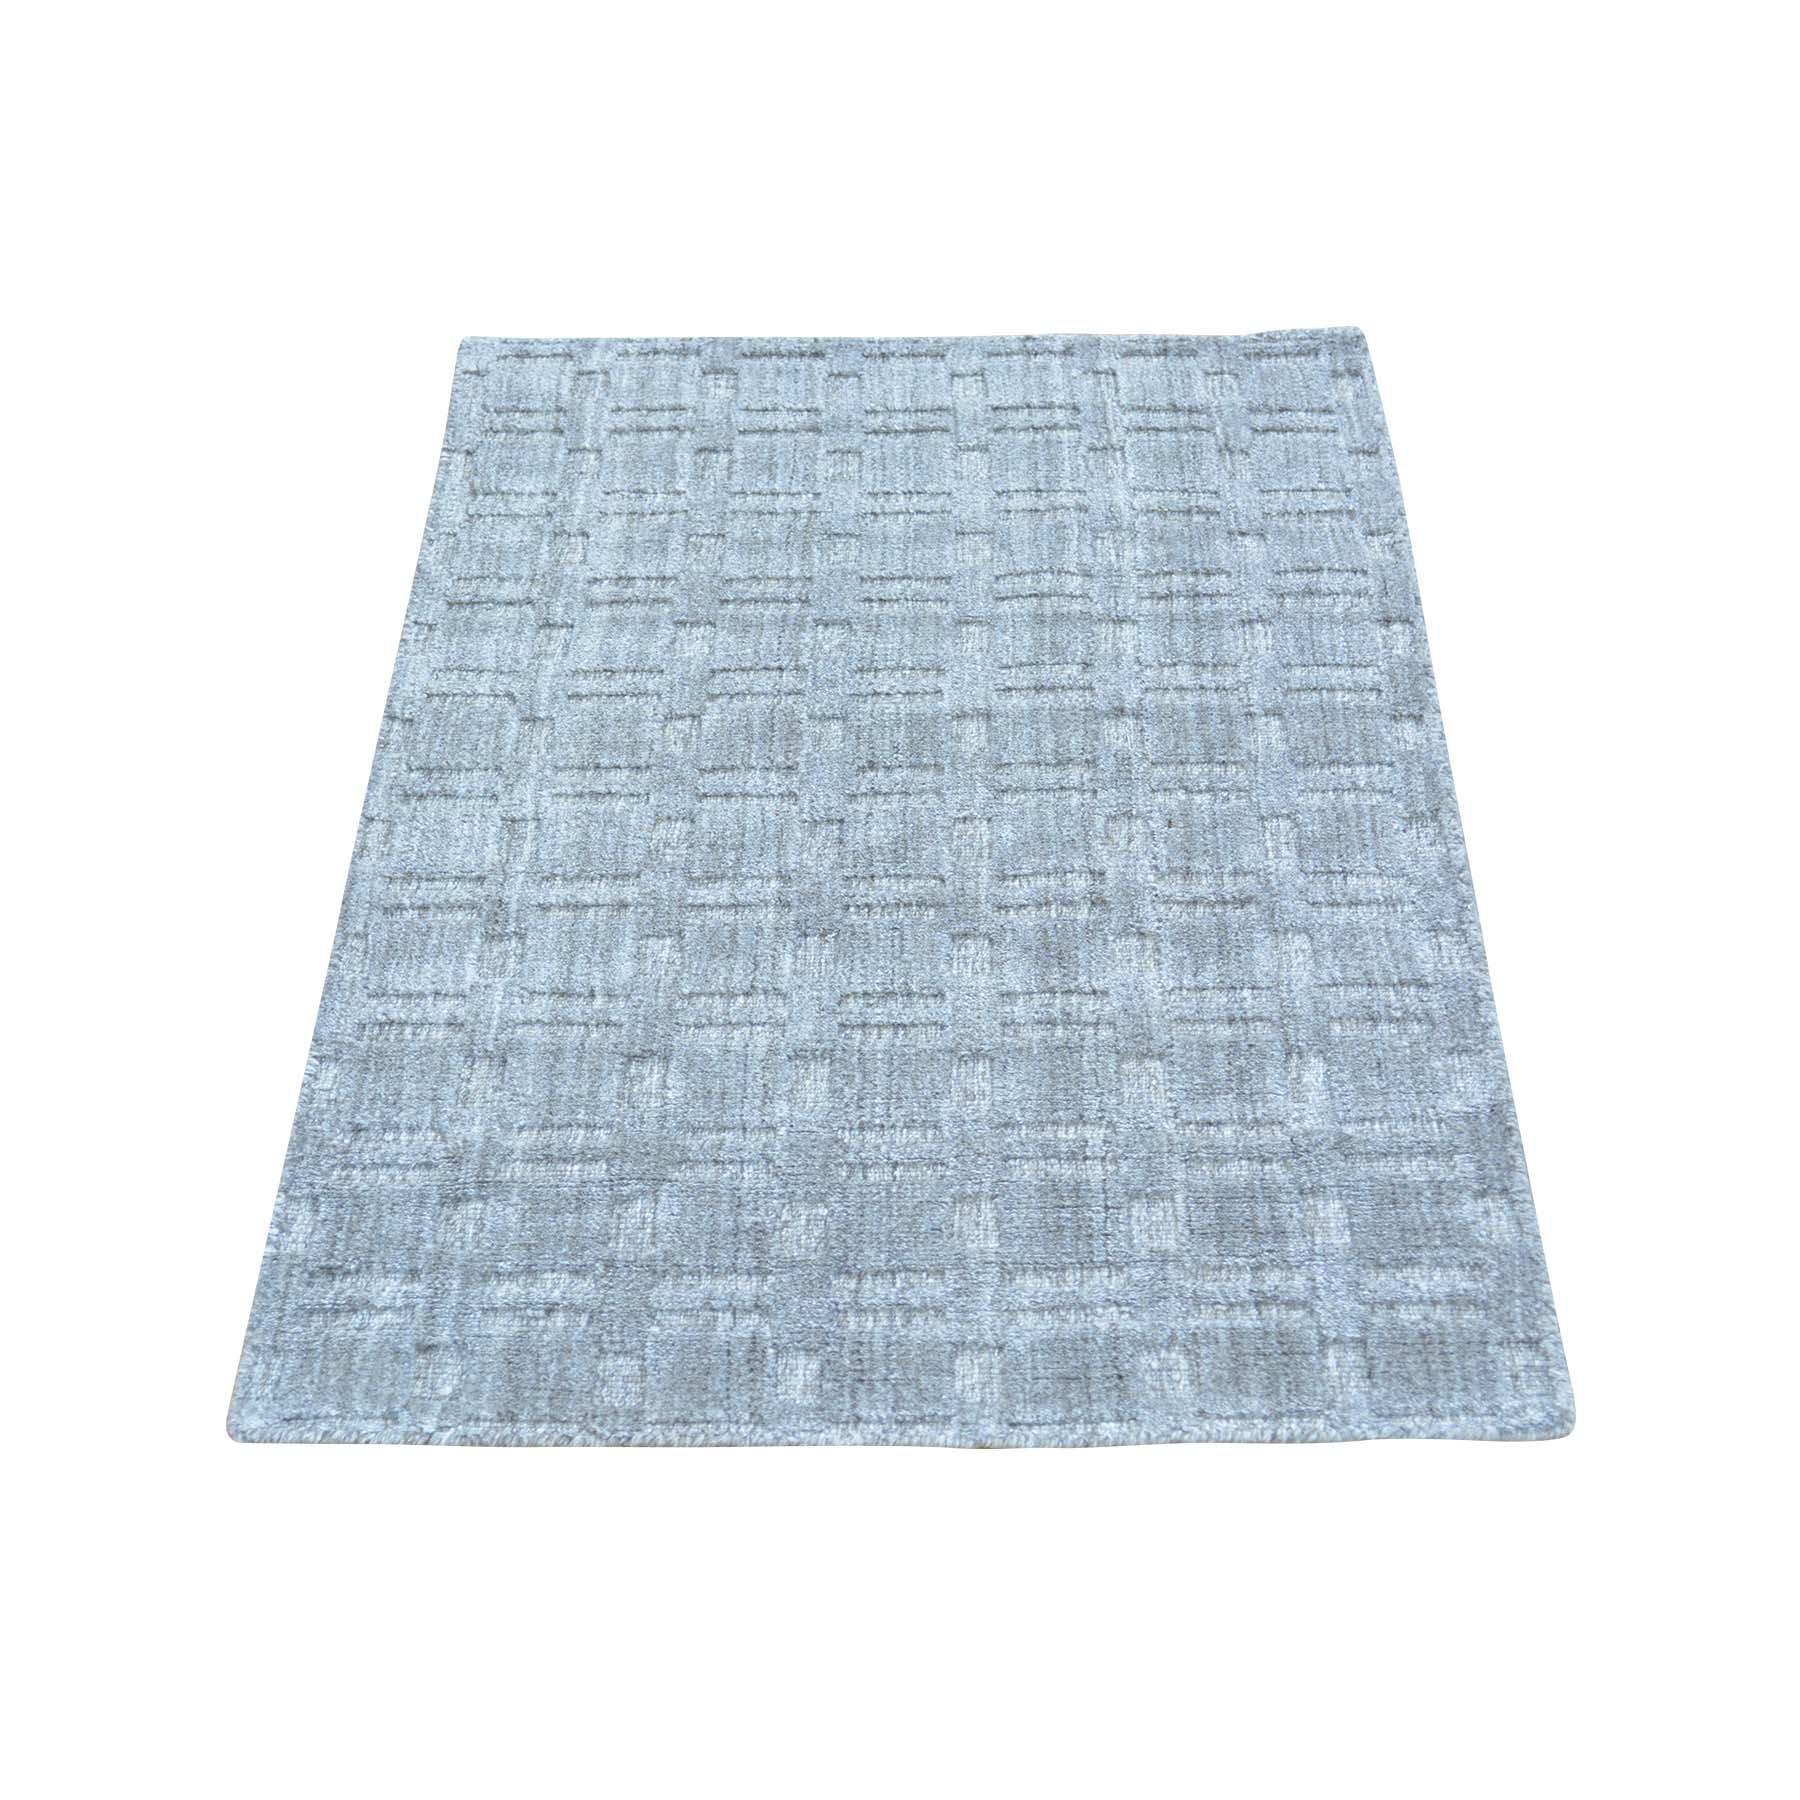 2'X3' Grey Tone On Tone Hand Loomed Wool And Silk Rug moab99dc